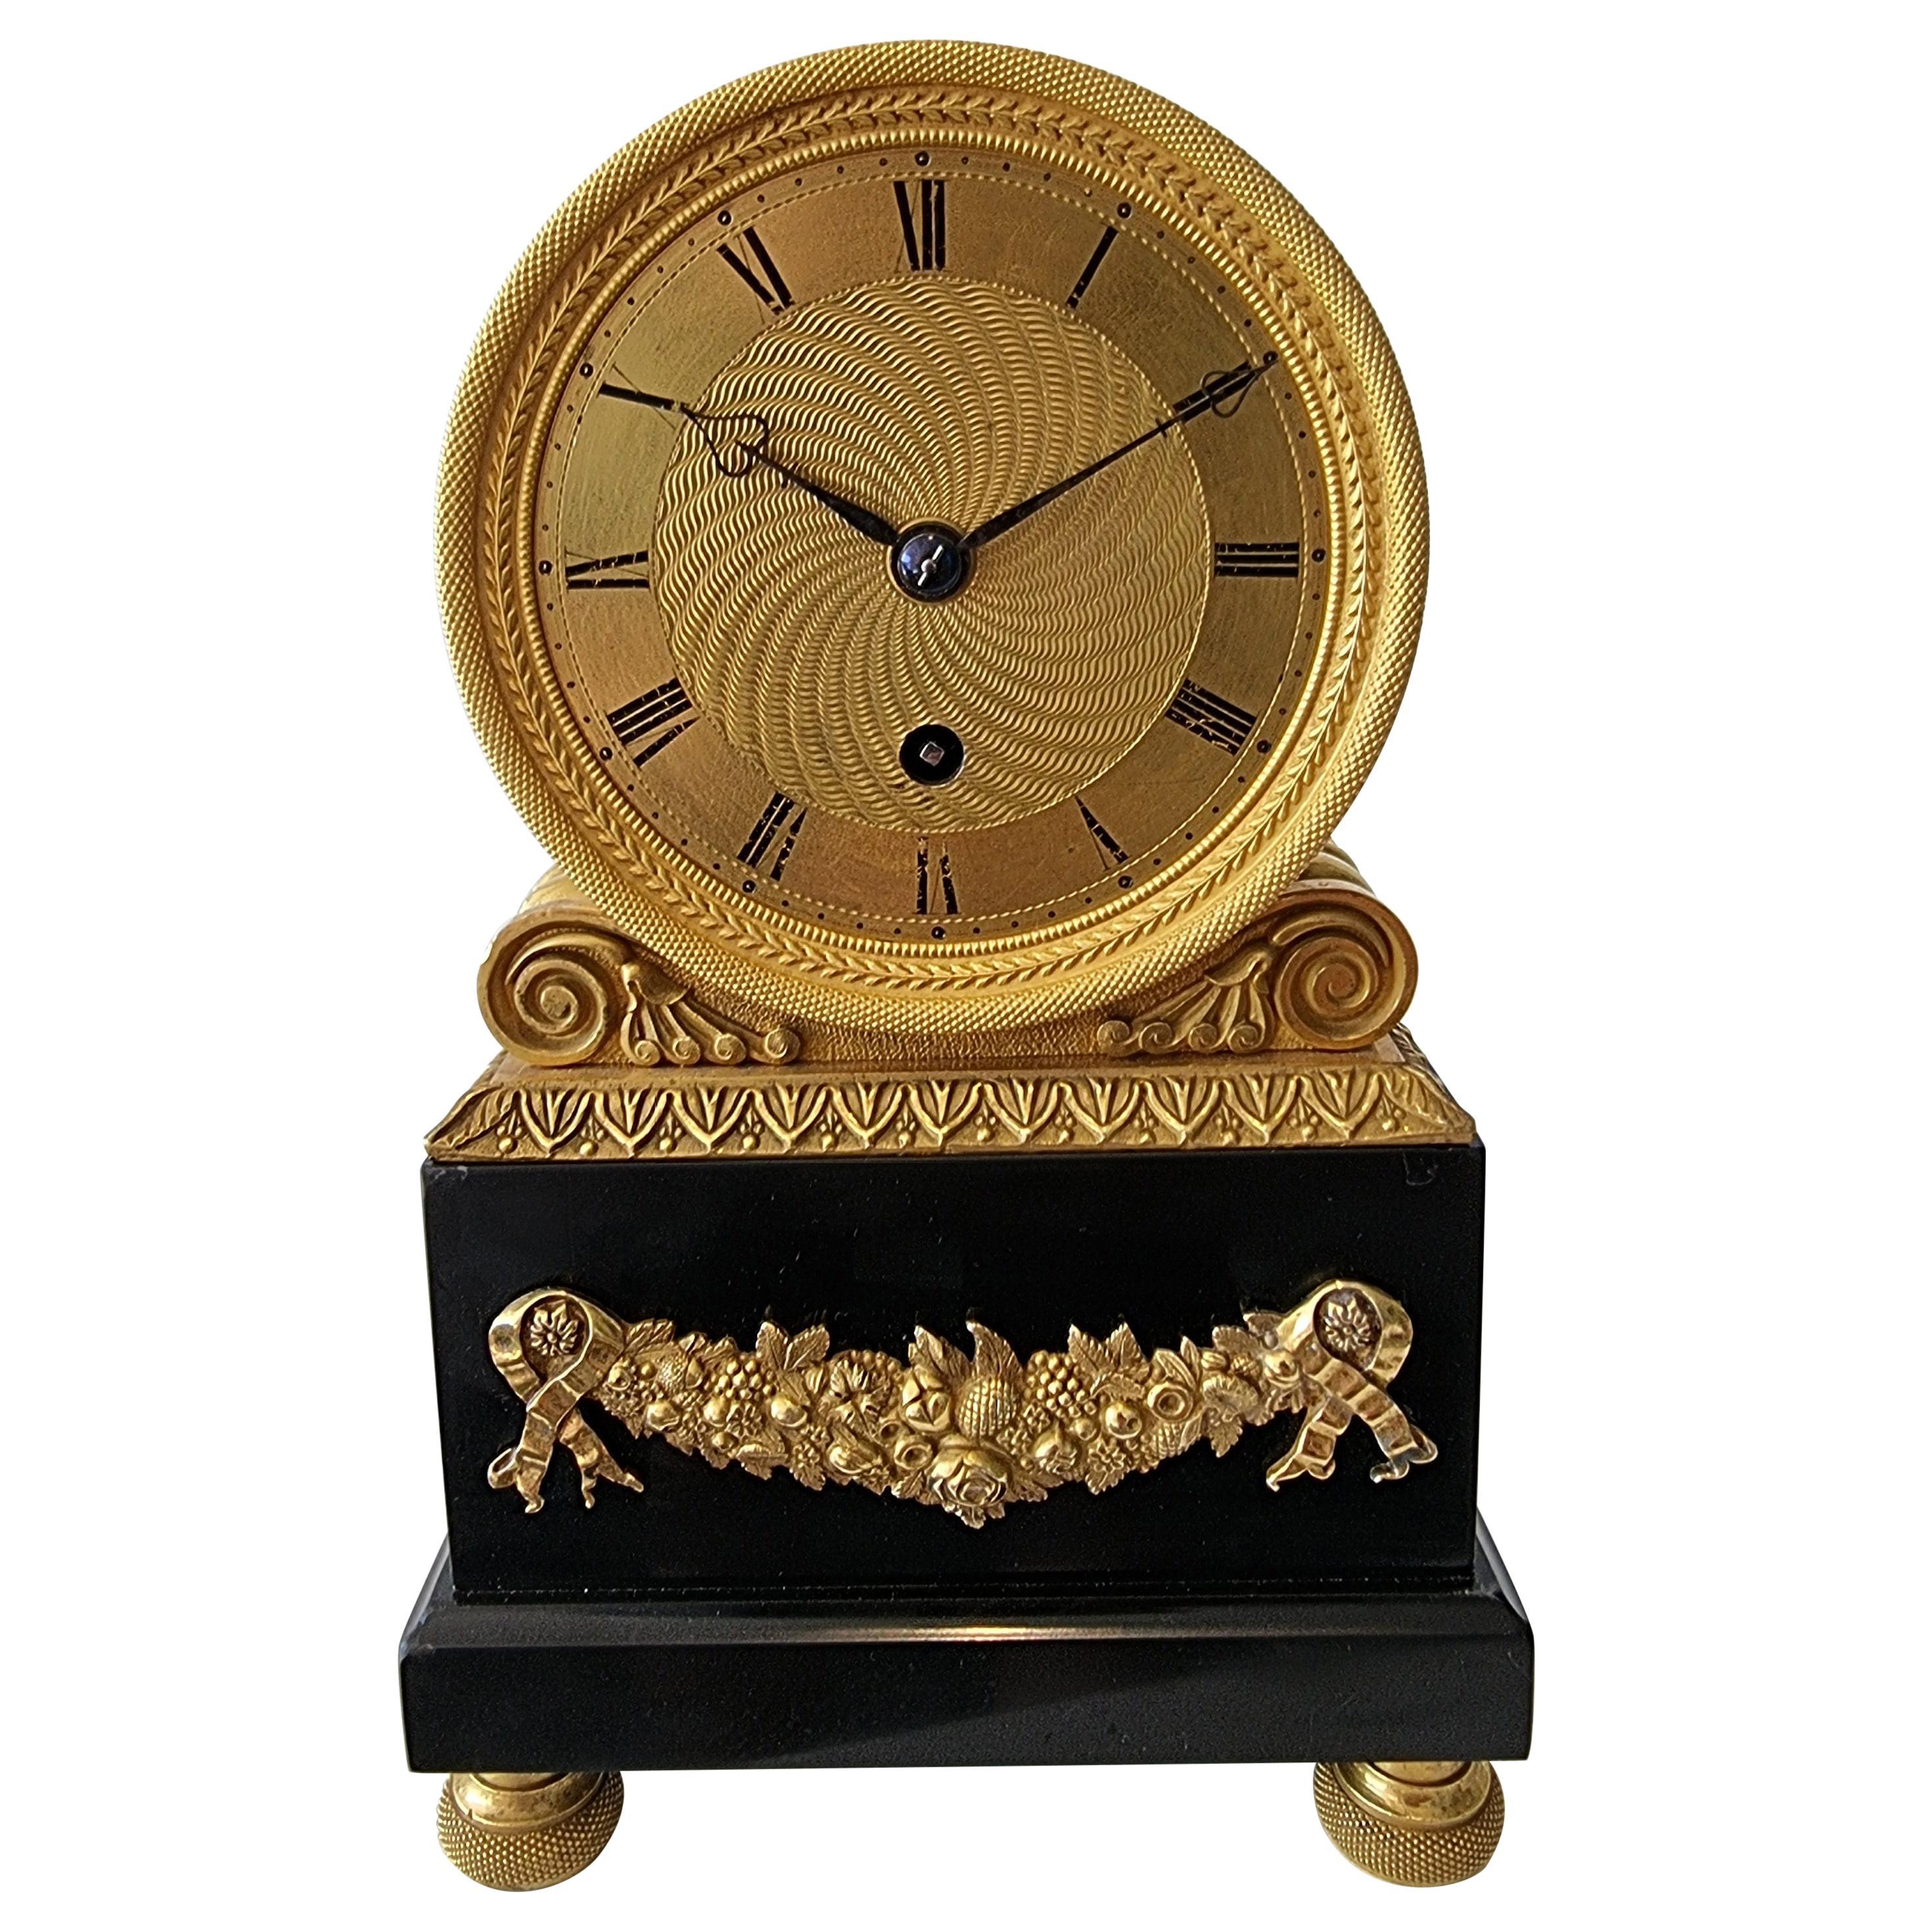 English Regency Fusee Mantel Clock, by Viner in Ormolu and Derbyshire Marble